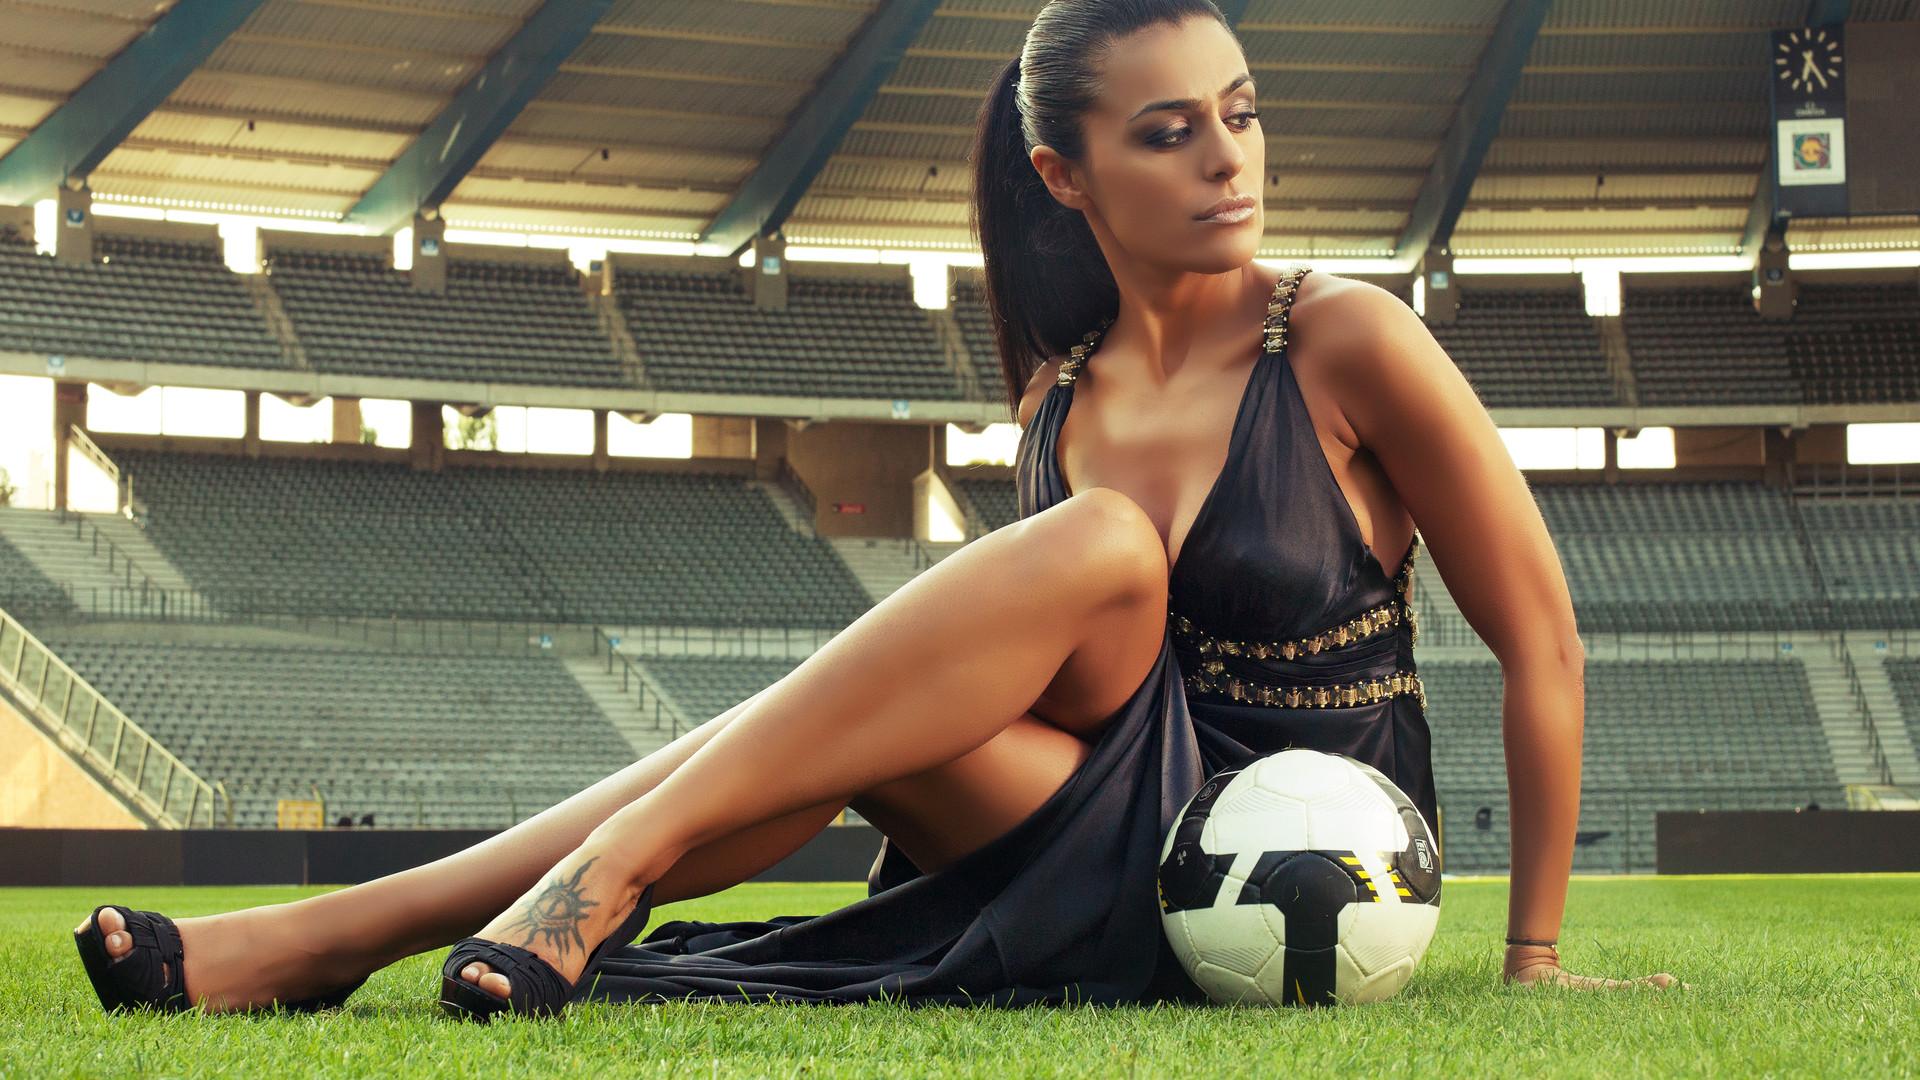 Sports Women Football Desktop Wallpaper